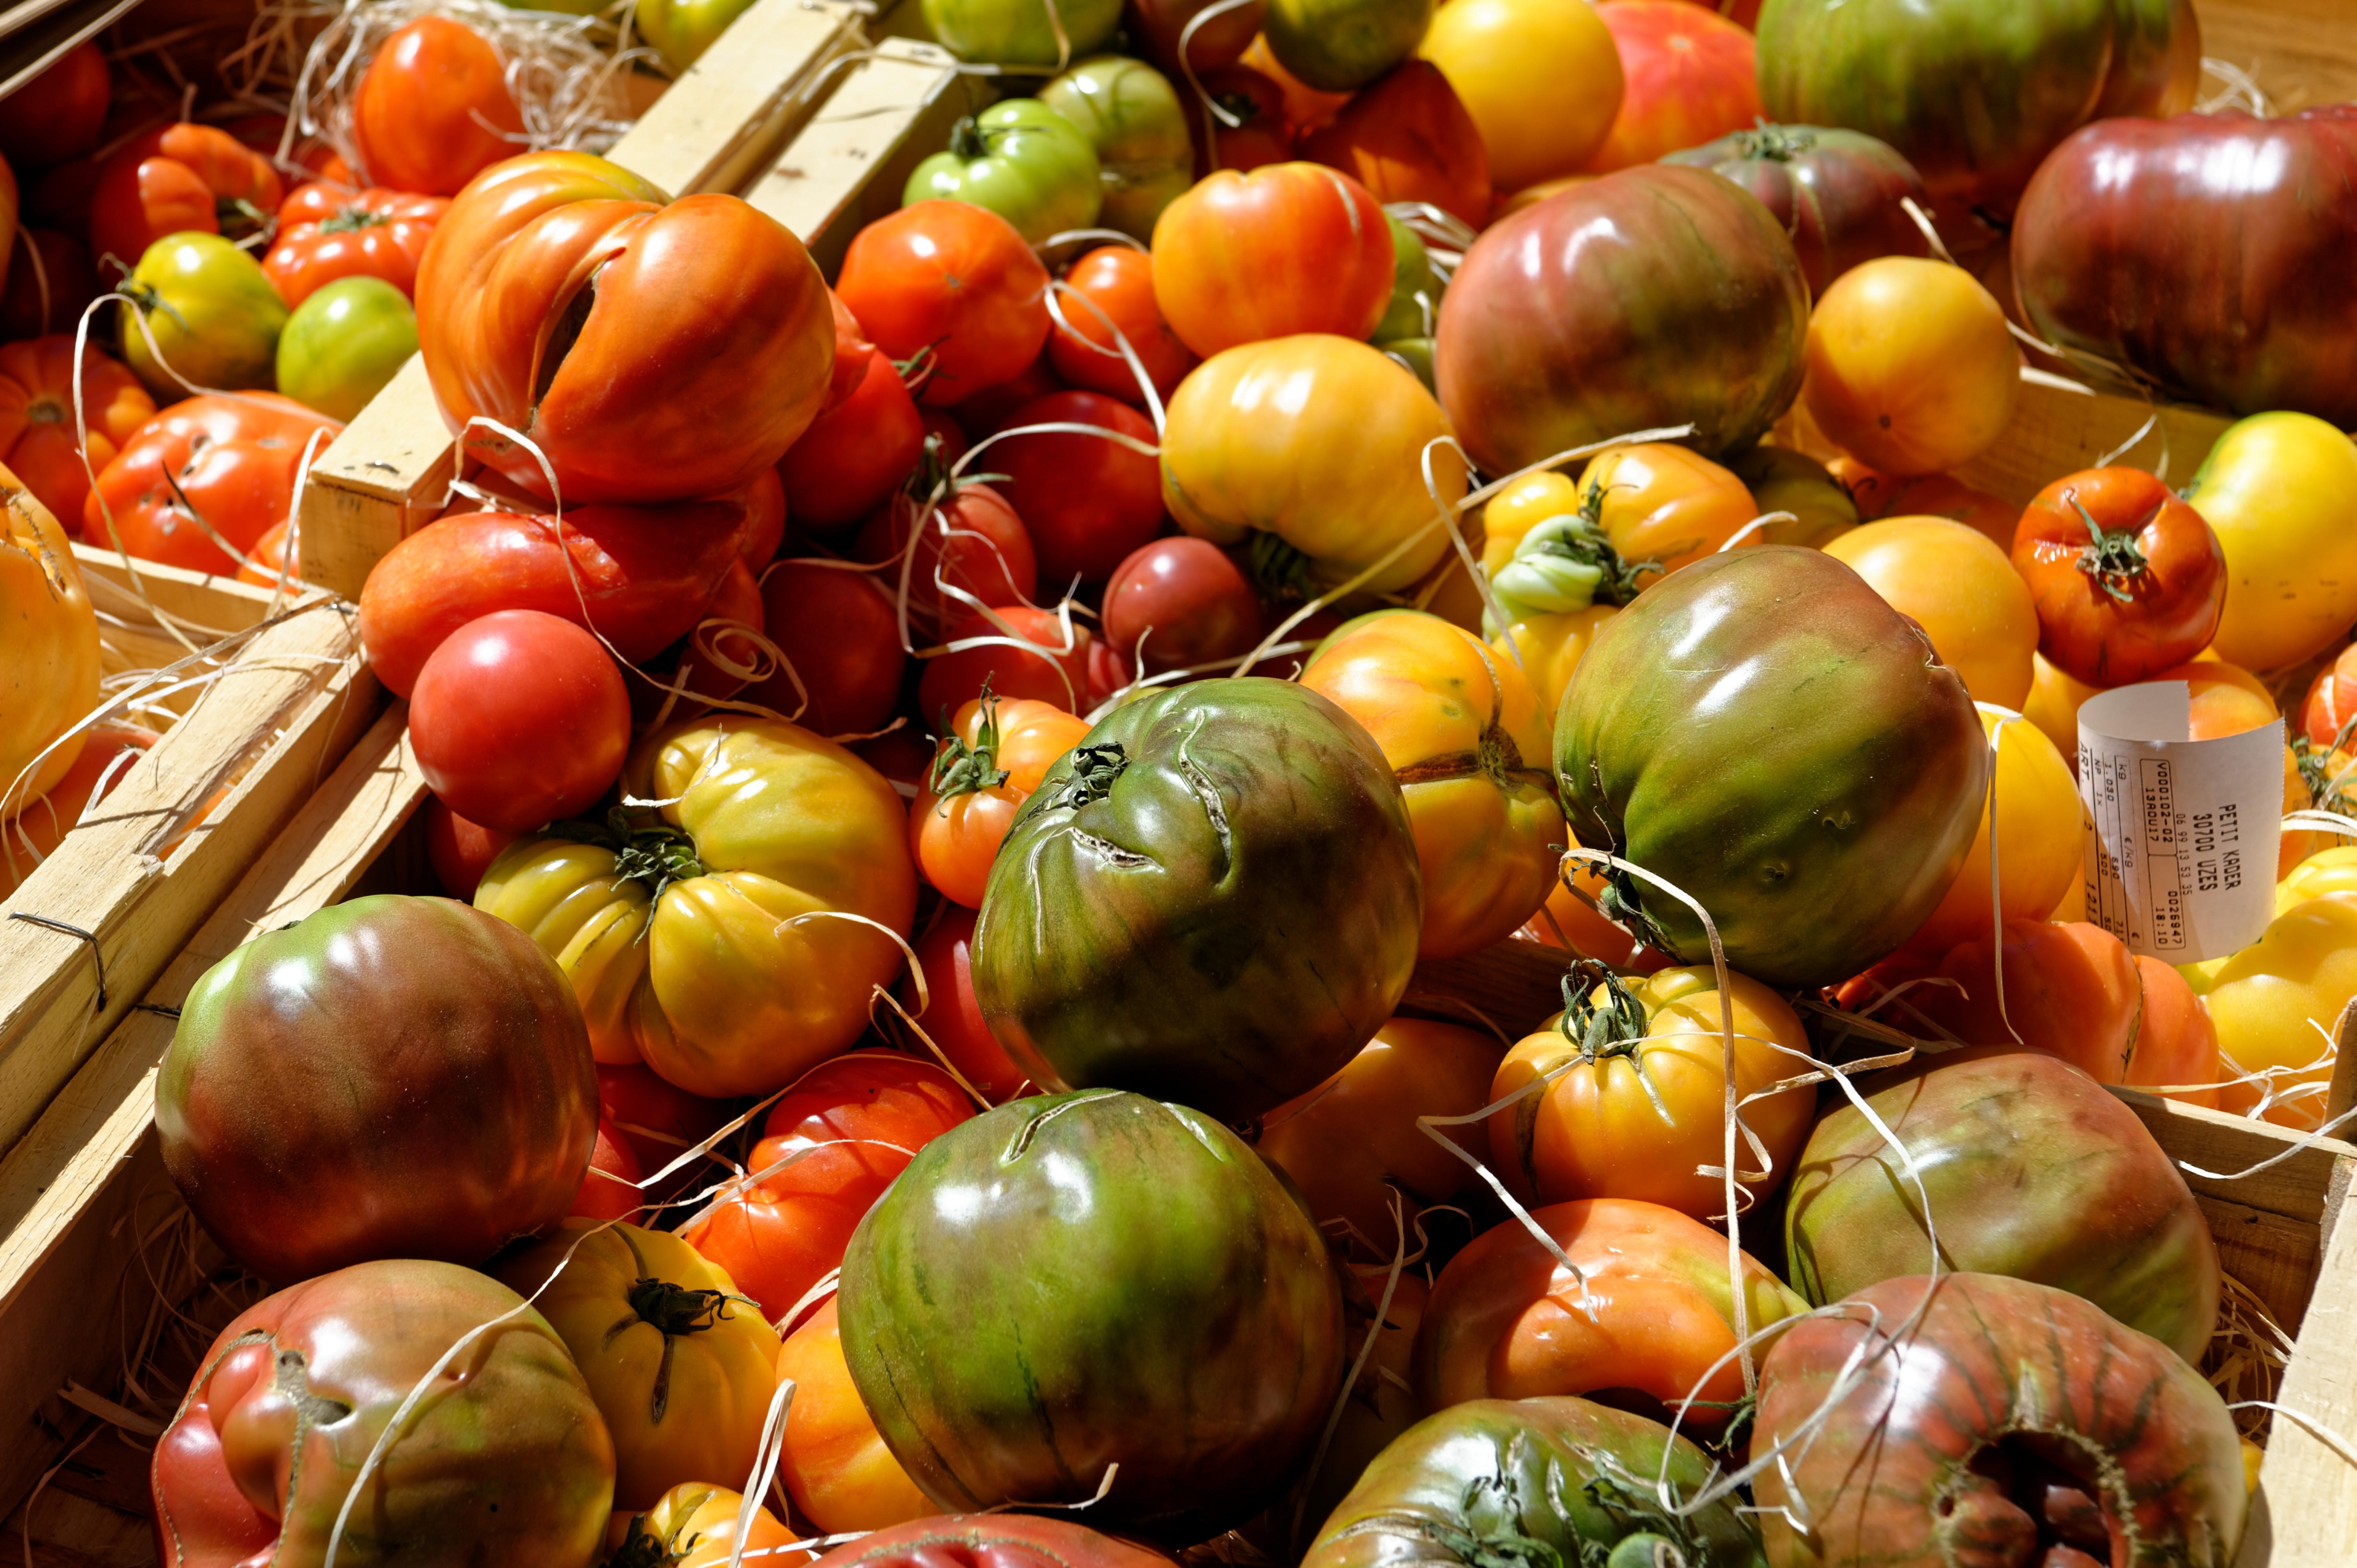 fruitsetlegumesdesaisonlocal-6704